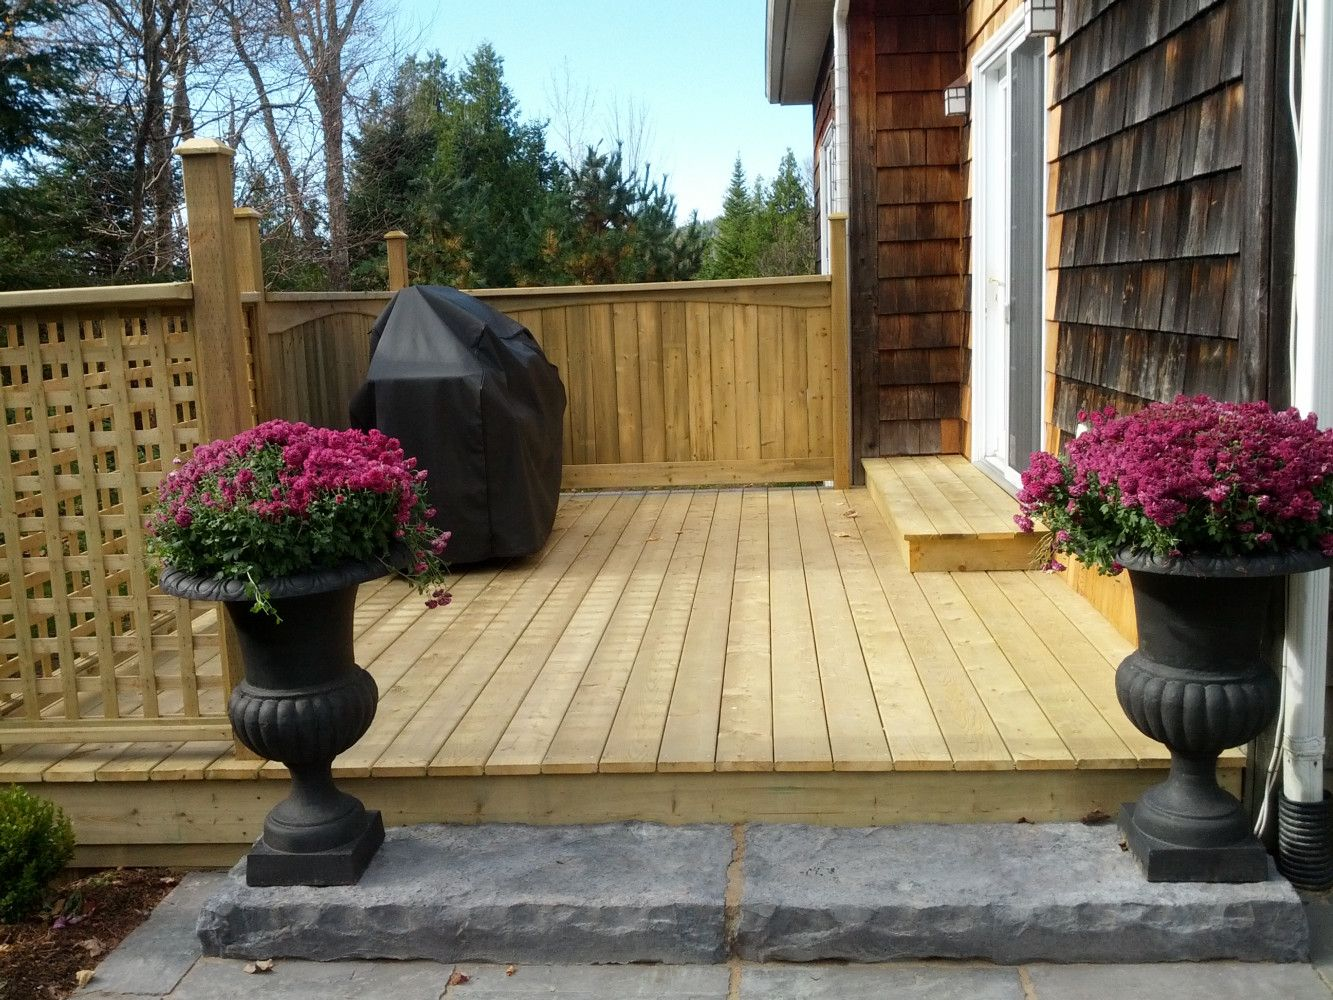 Best Low Elevation Decks Steps From Back Door Low Level Deck 400 x 300